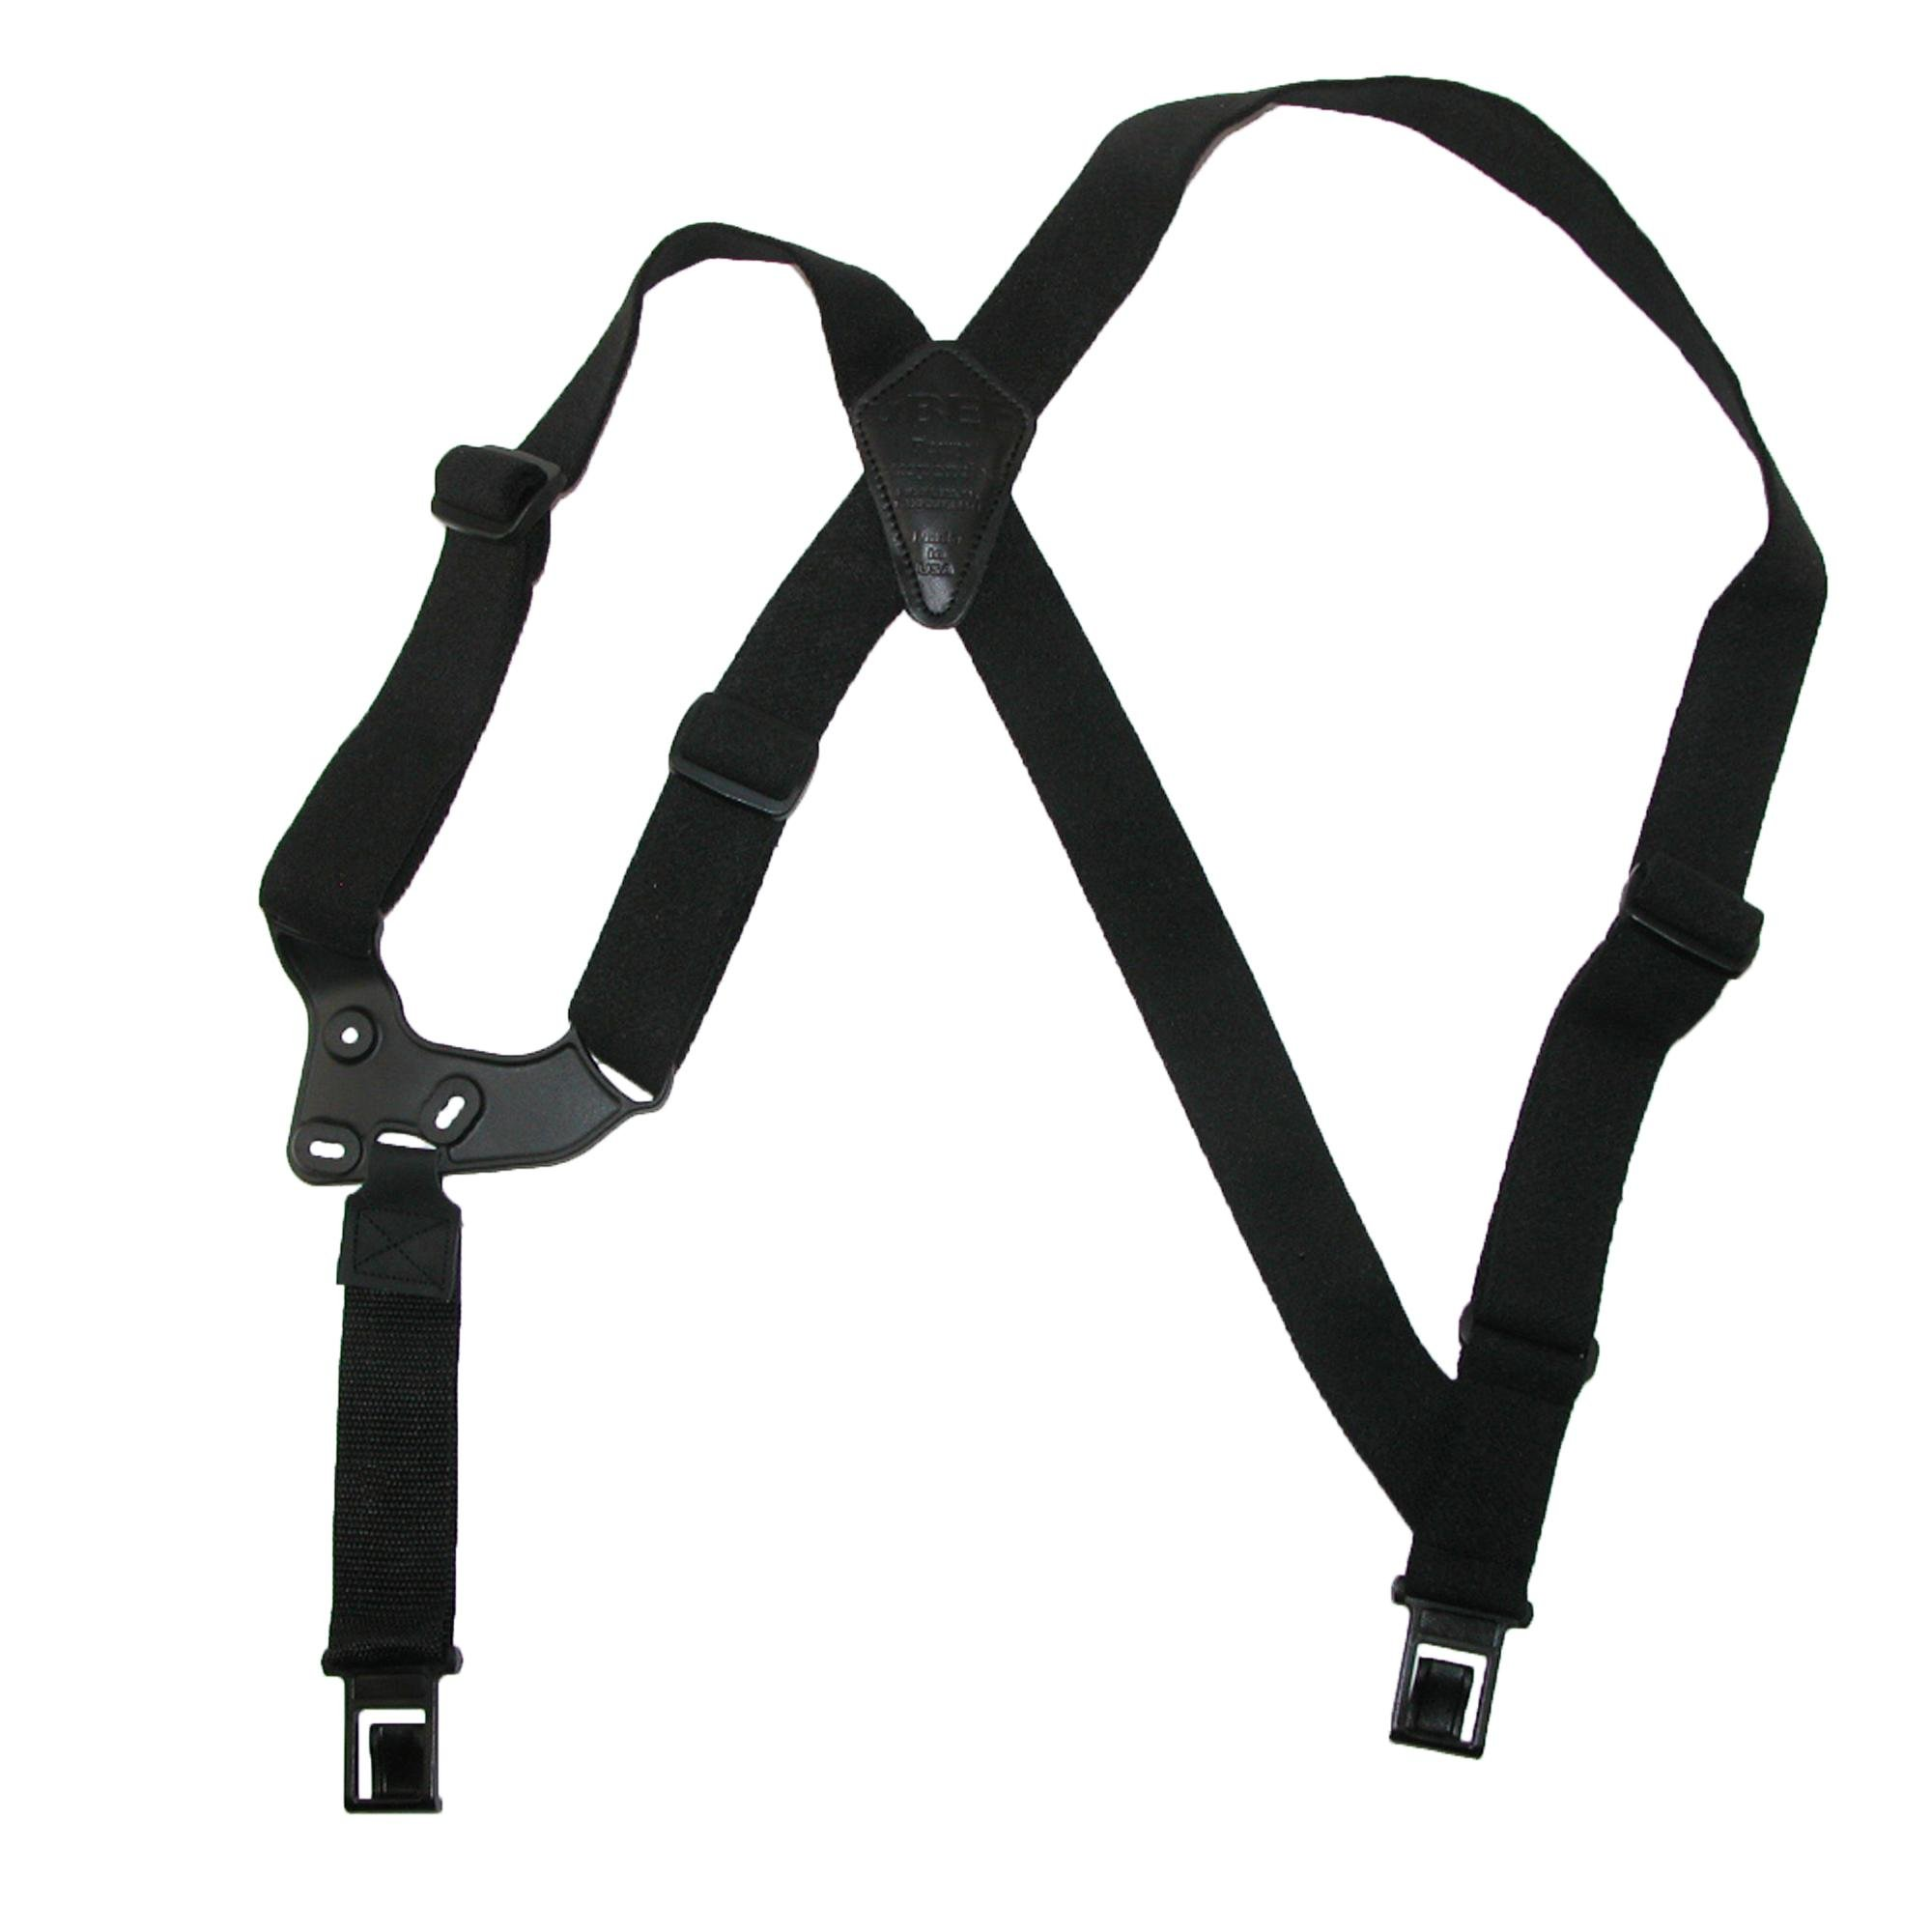 Perry Suspenders Elastic Right Handed UBEE Shoulder Harness, Black